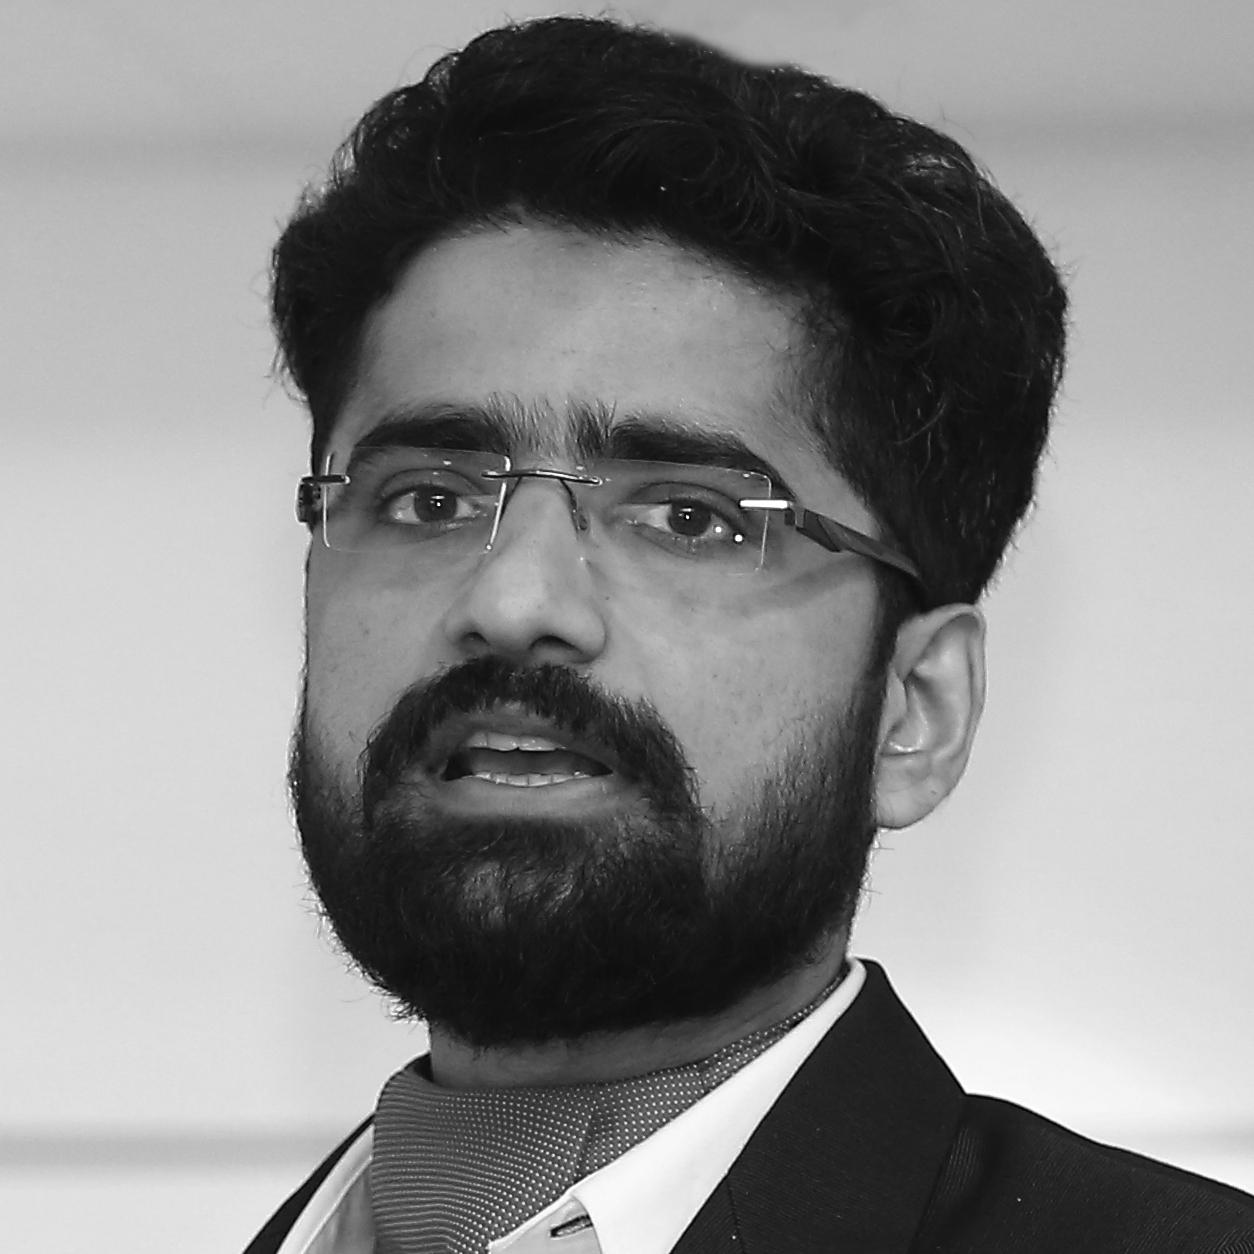 HITLAB Summit Mohammad Ameel